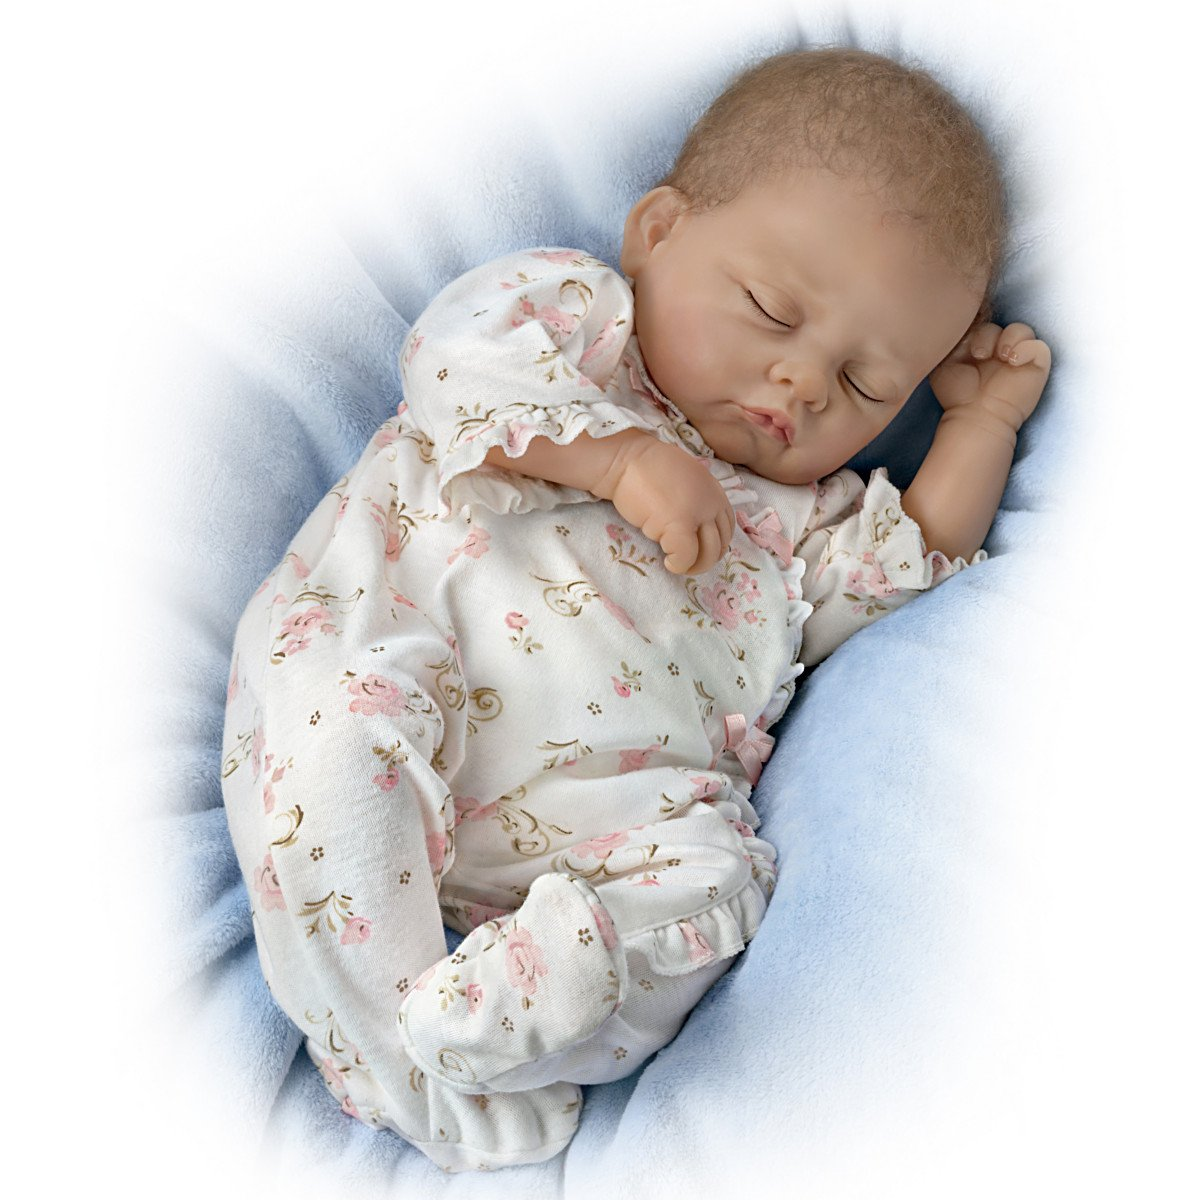 Ashton Drake Sophia Breathes Interactive & Realistic Newborn Baby Doll